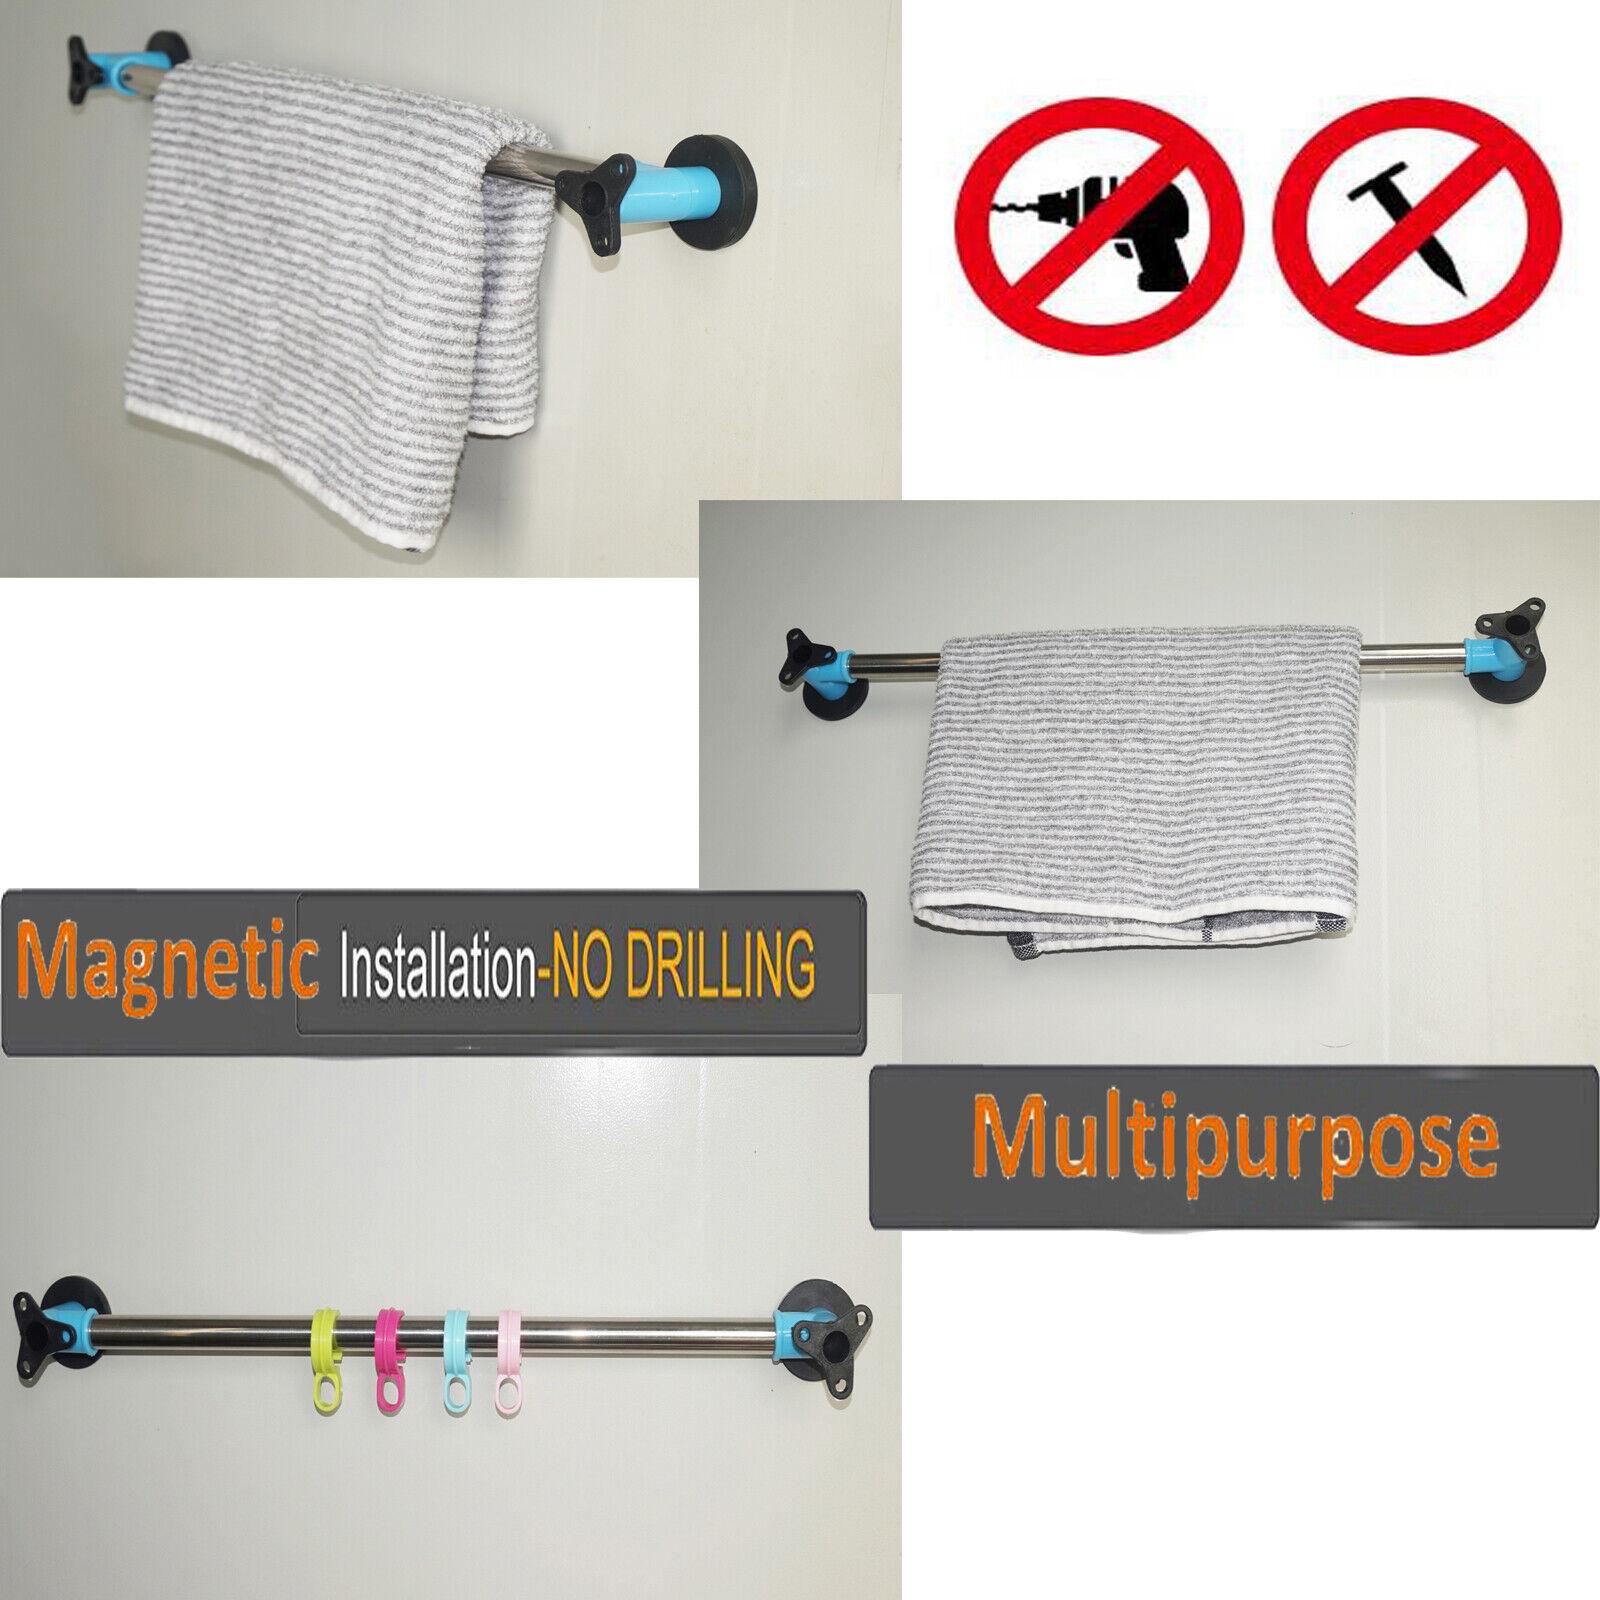 Magnetic Modern Towel Bar,Stainless Steel,for Refrigerator,Kitchen Sink,ironDoor